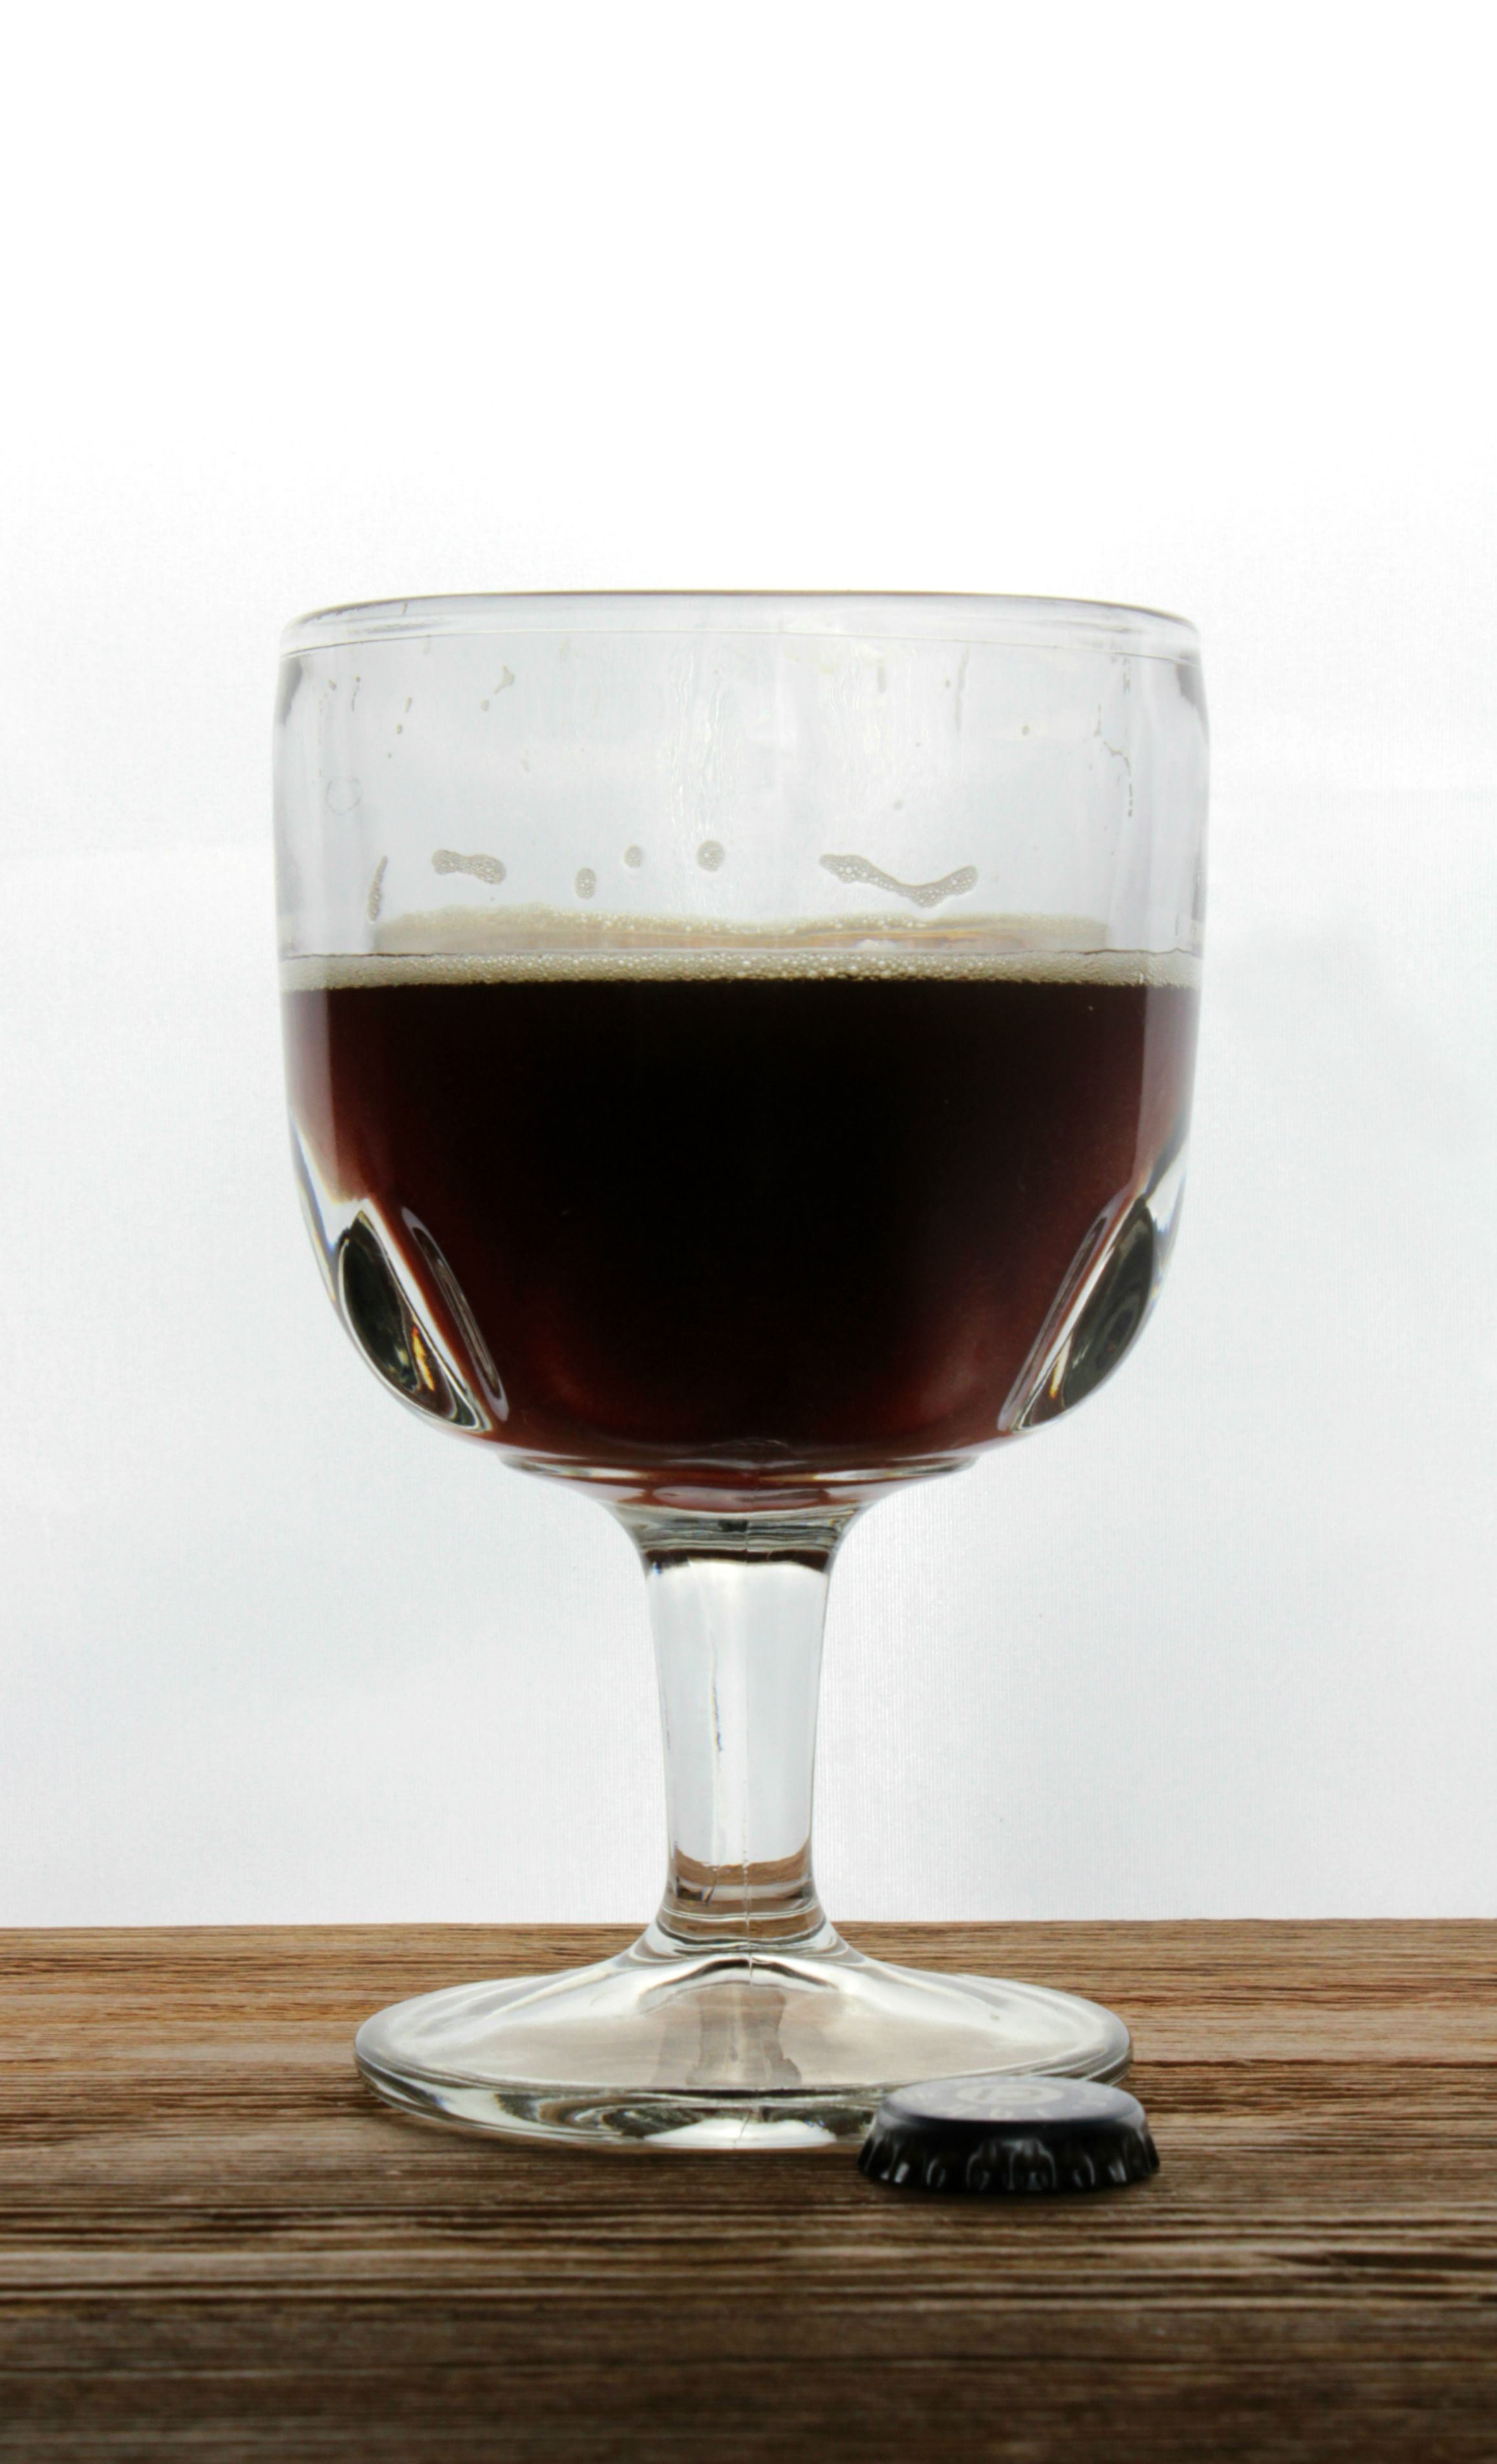 st-bernardus-abt-12-goblet-glass